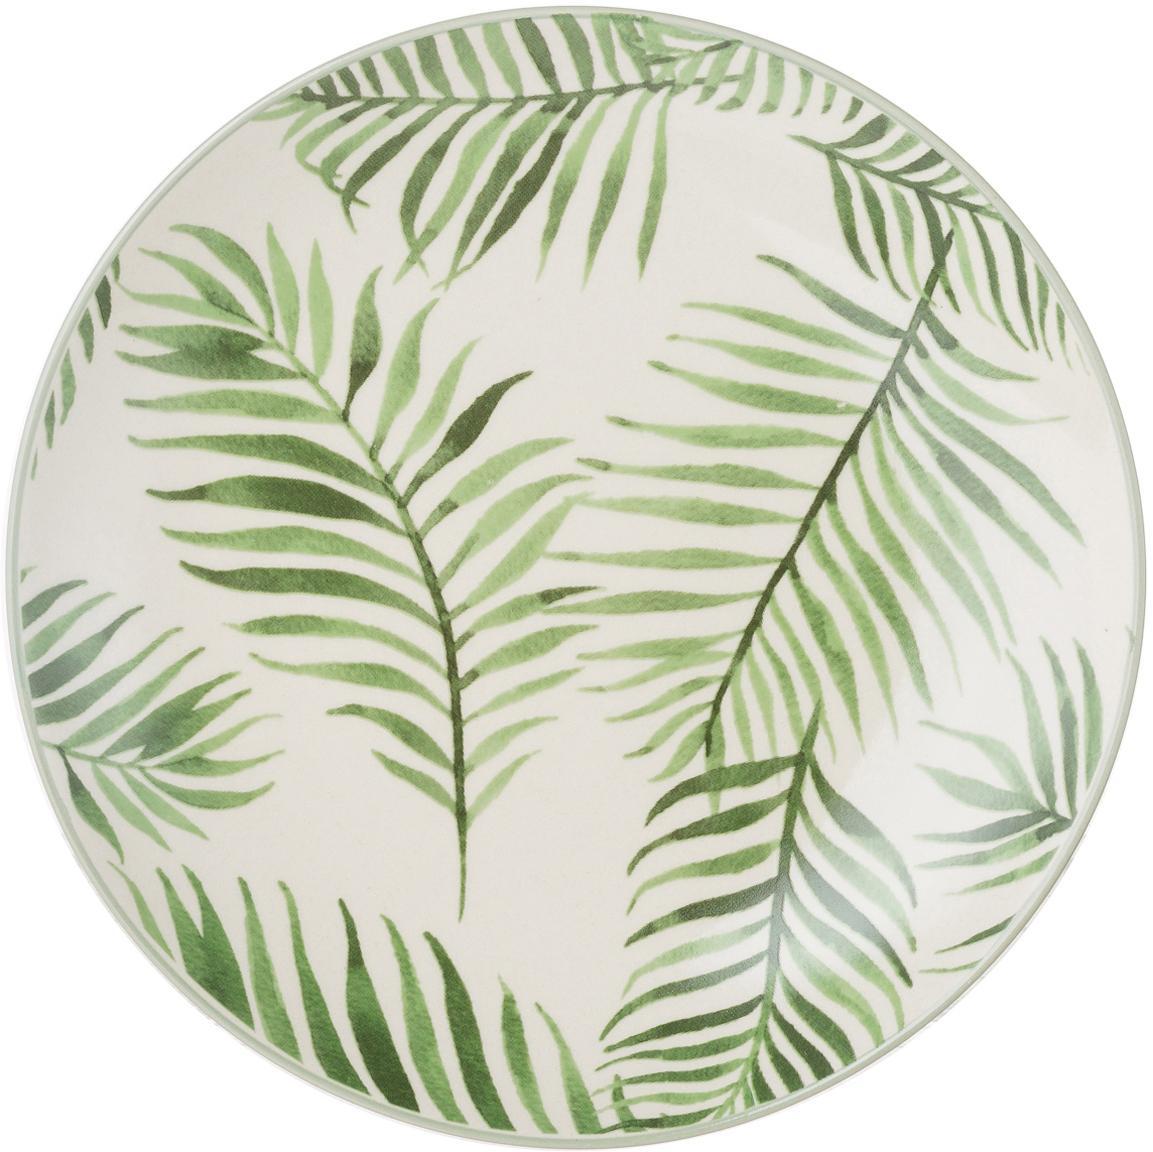 Platos postre Jade, 4uds., Gres, Beige, verde, Ø 20 cm